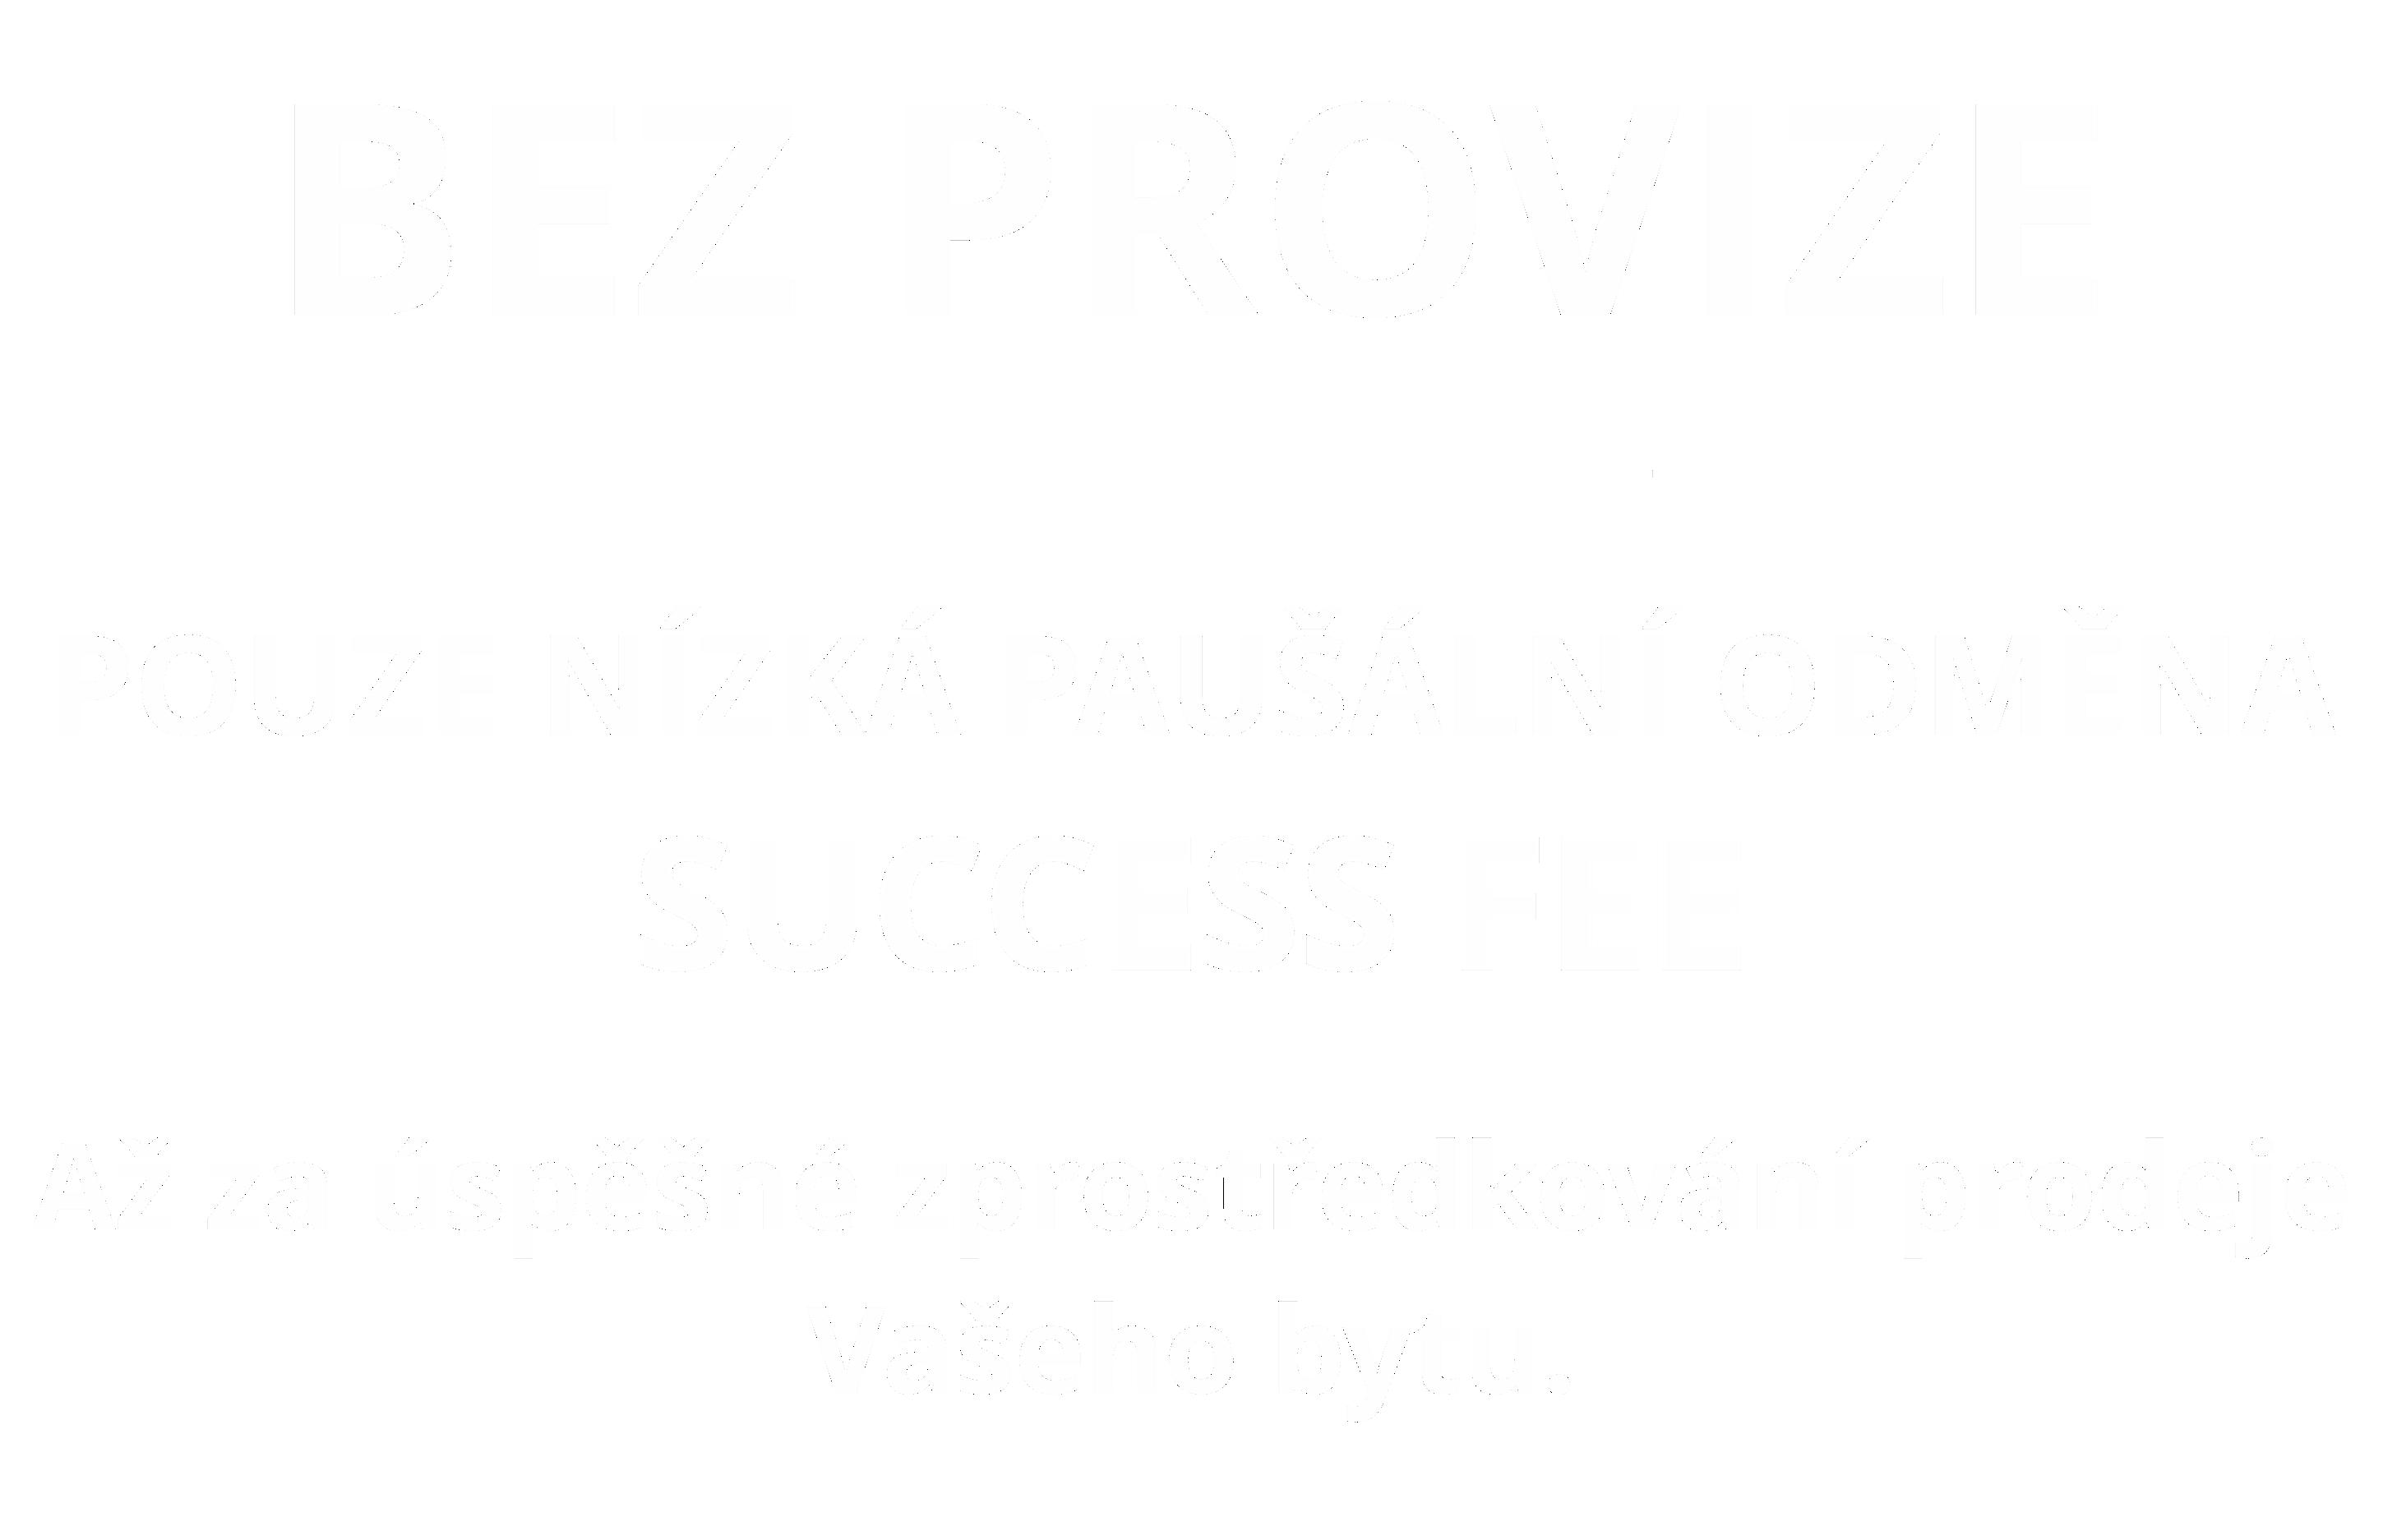 REAF_S2